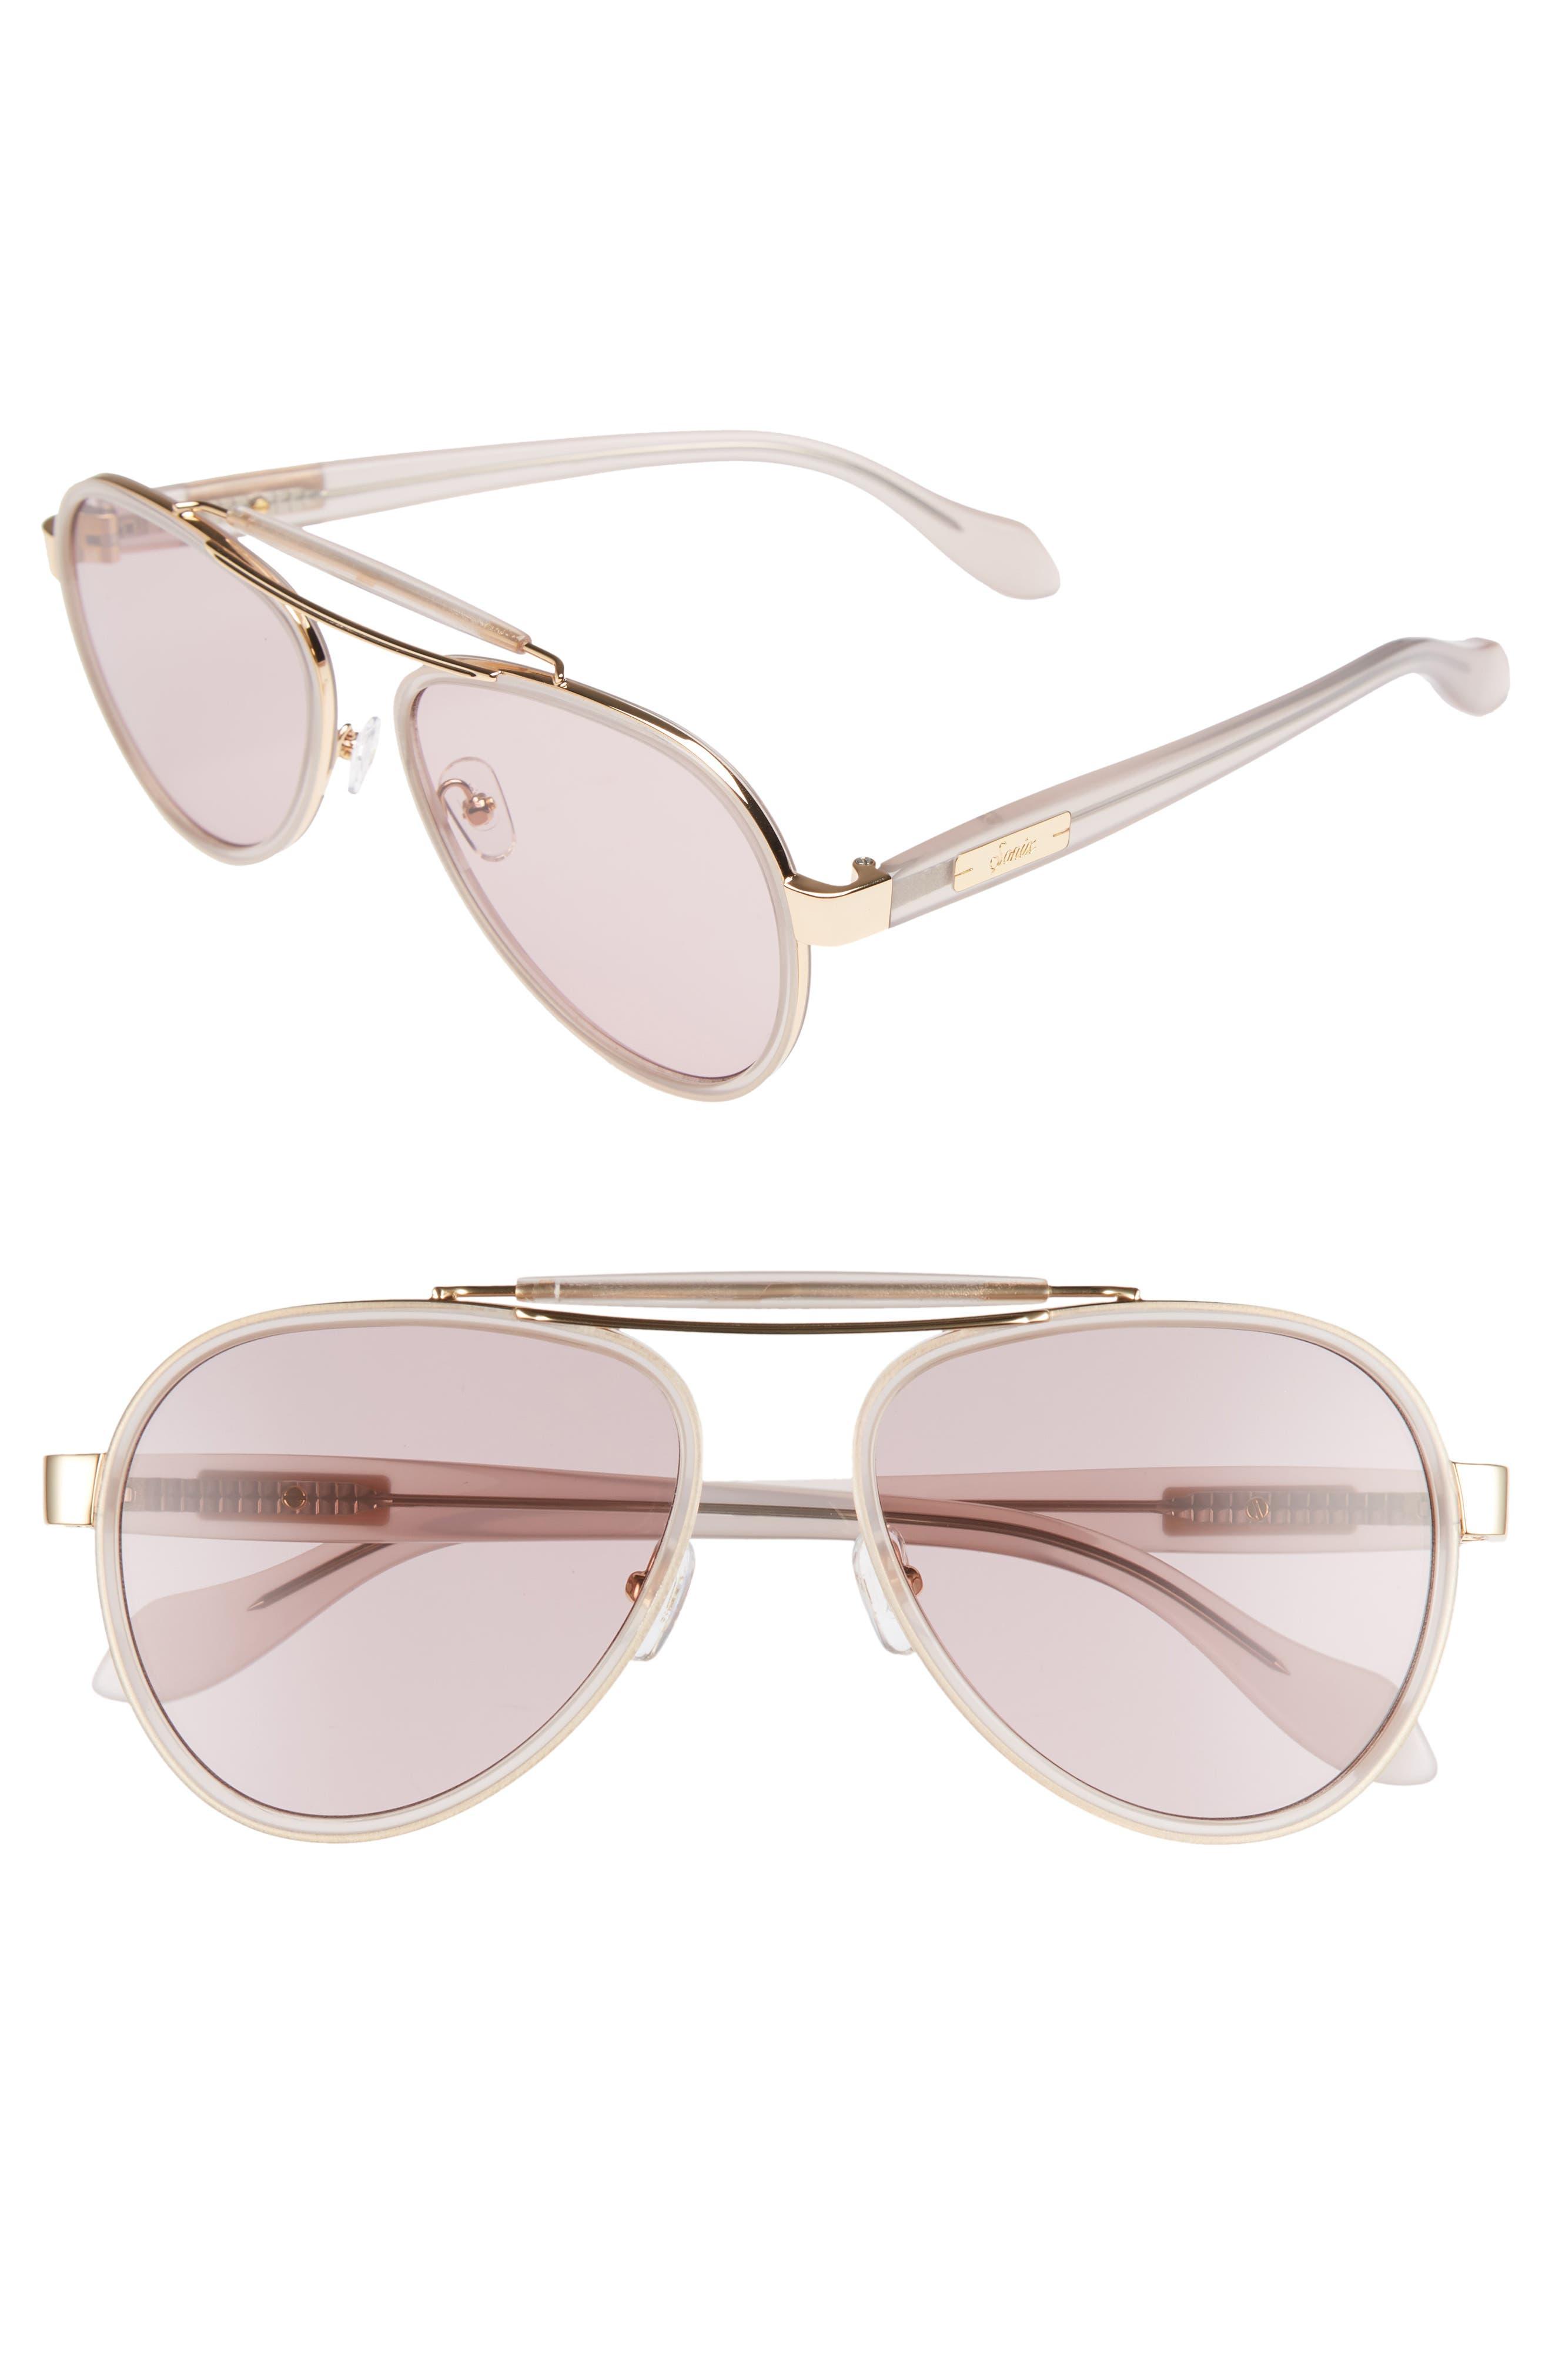 Sonix Pablo 58mm Aviator Sunglasses